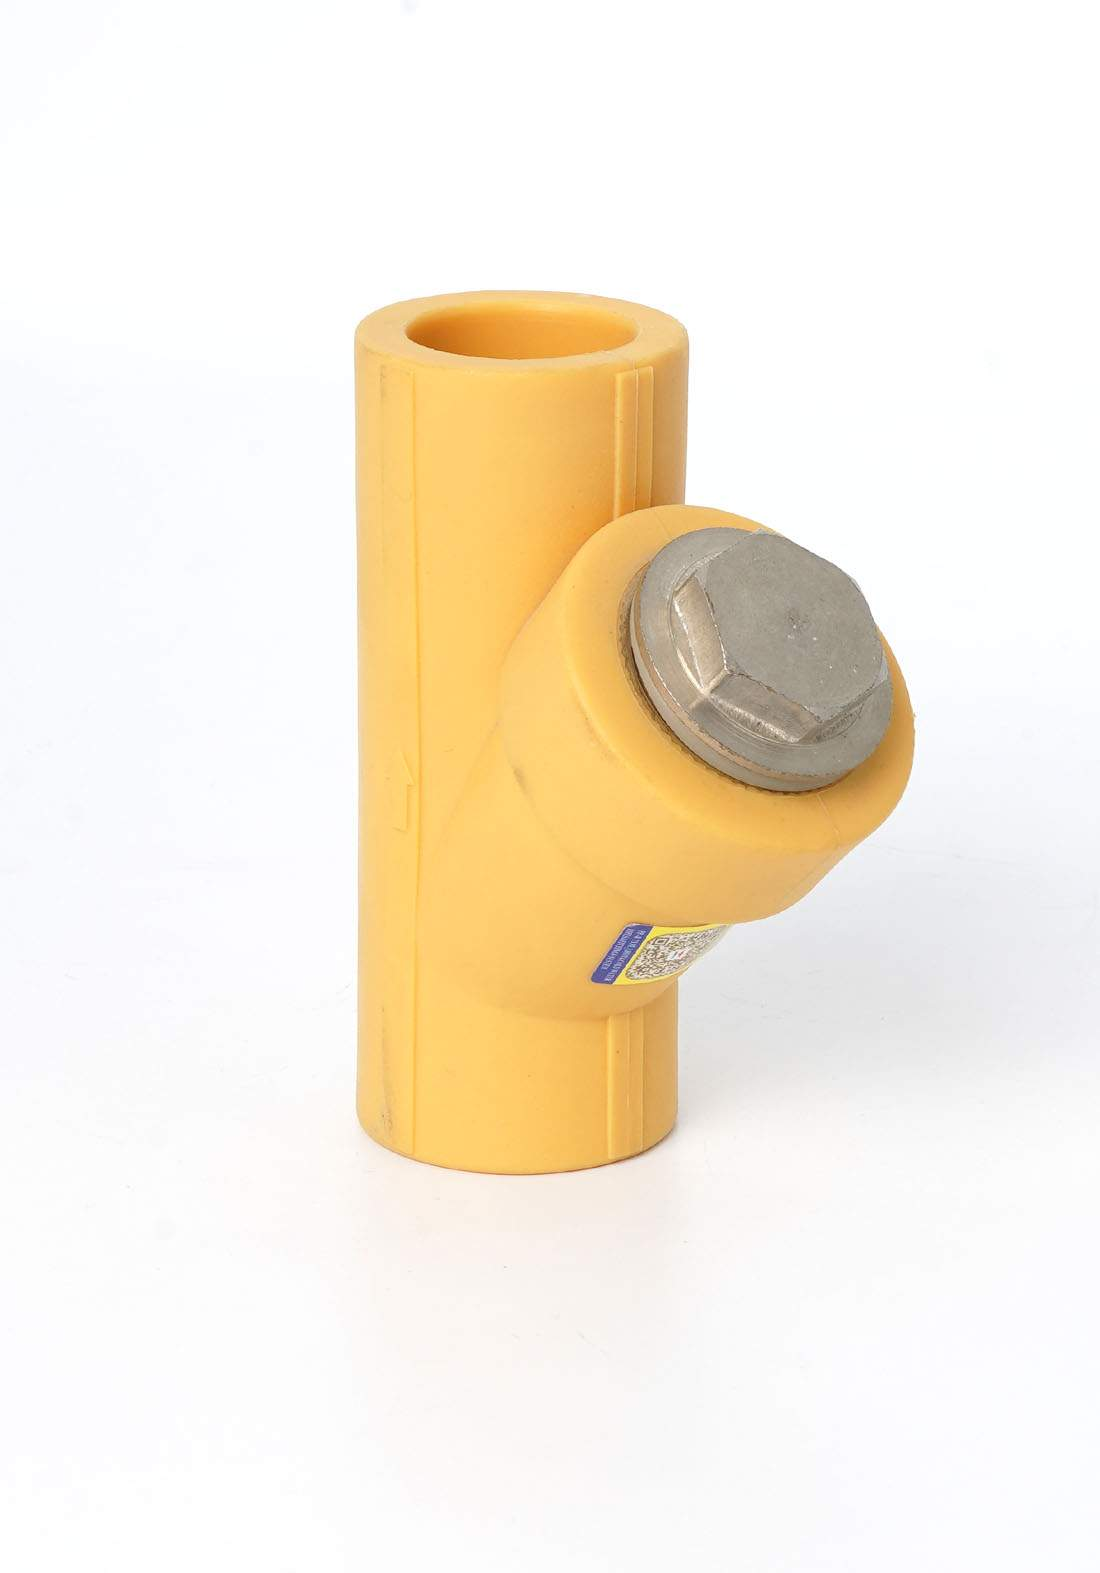 Wekts 5209 Splitting a advanced filter for pipes 25 mm تقسيم فلتر ماطور للأنابيب